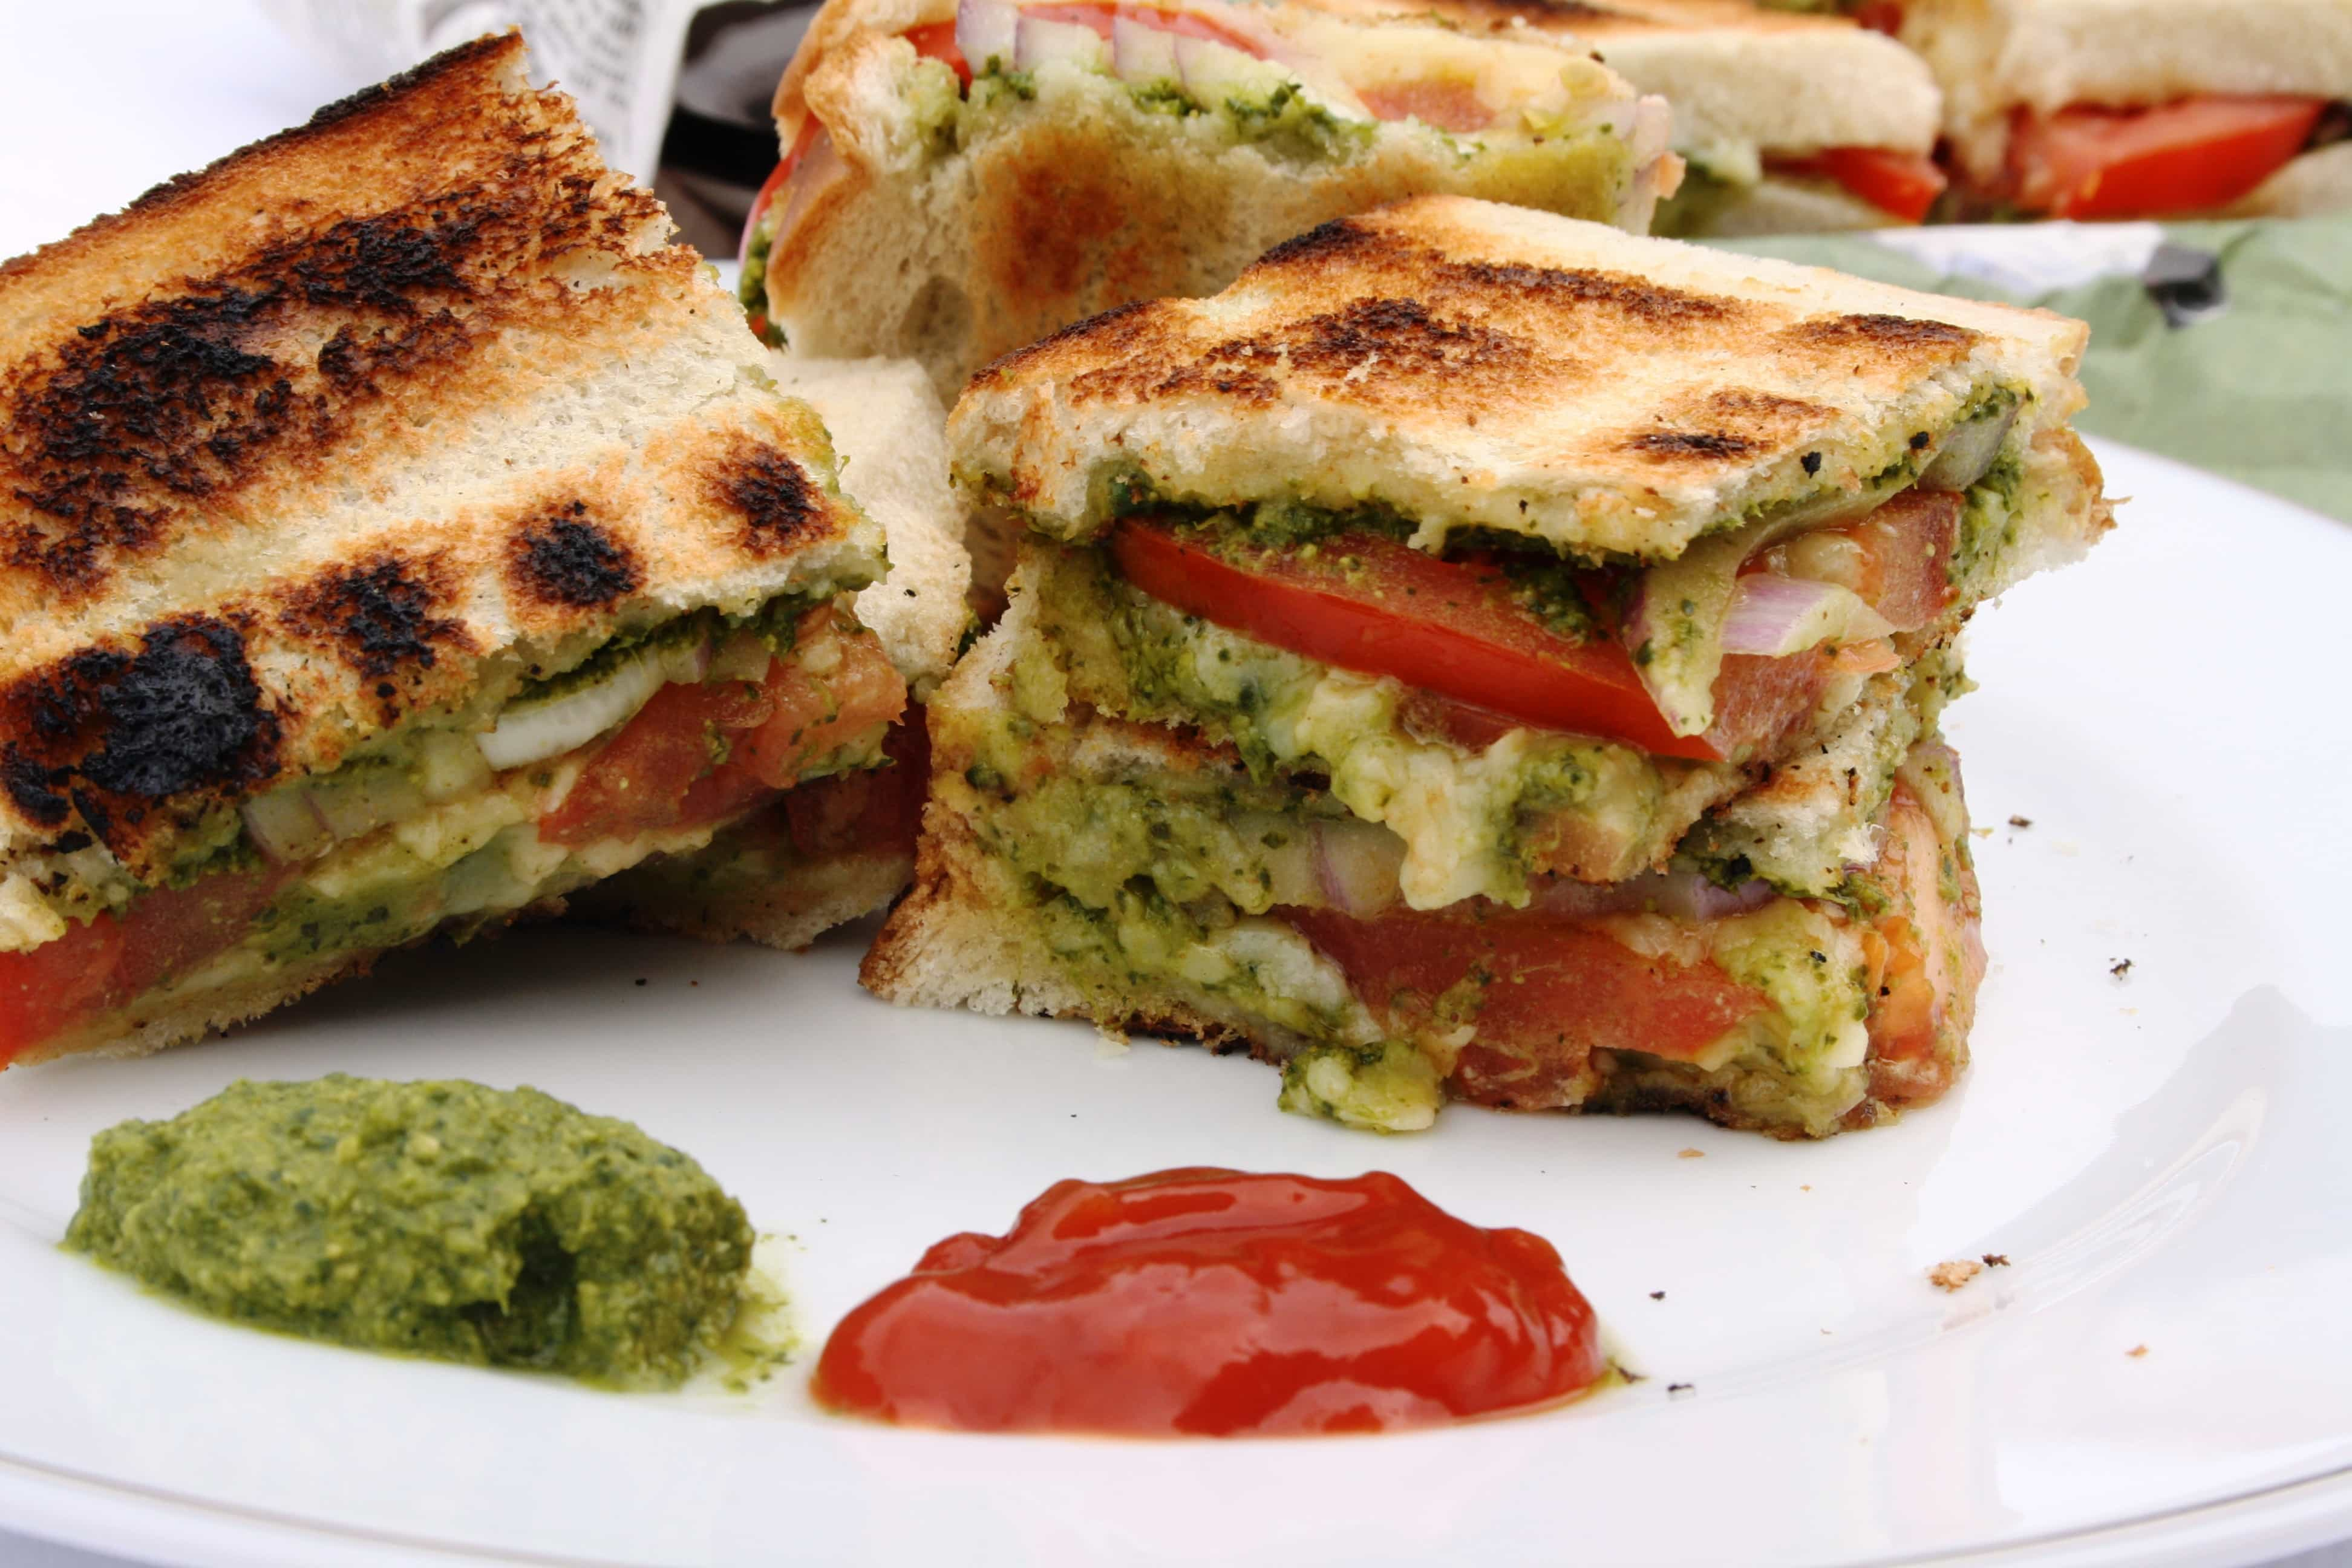 Mumbai Chilli Cheese Sandwich